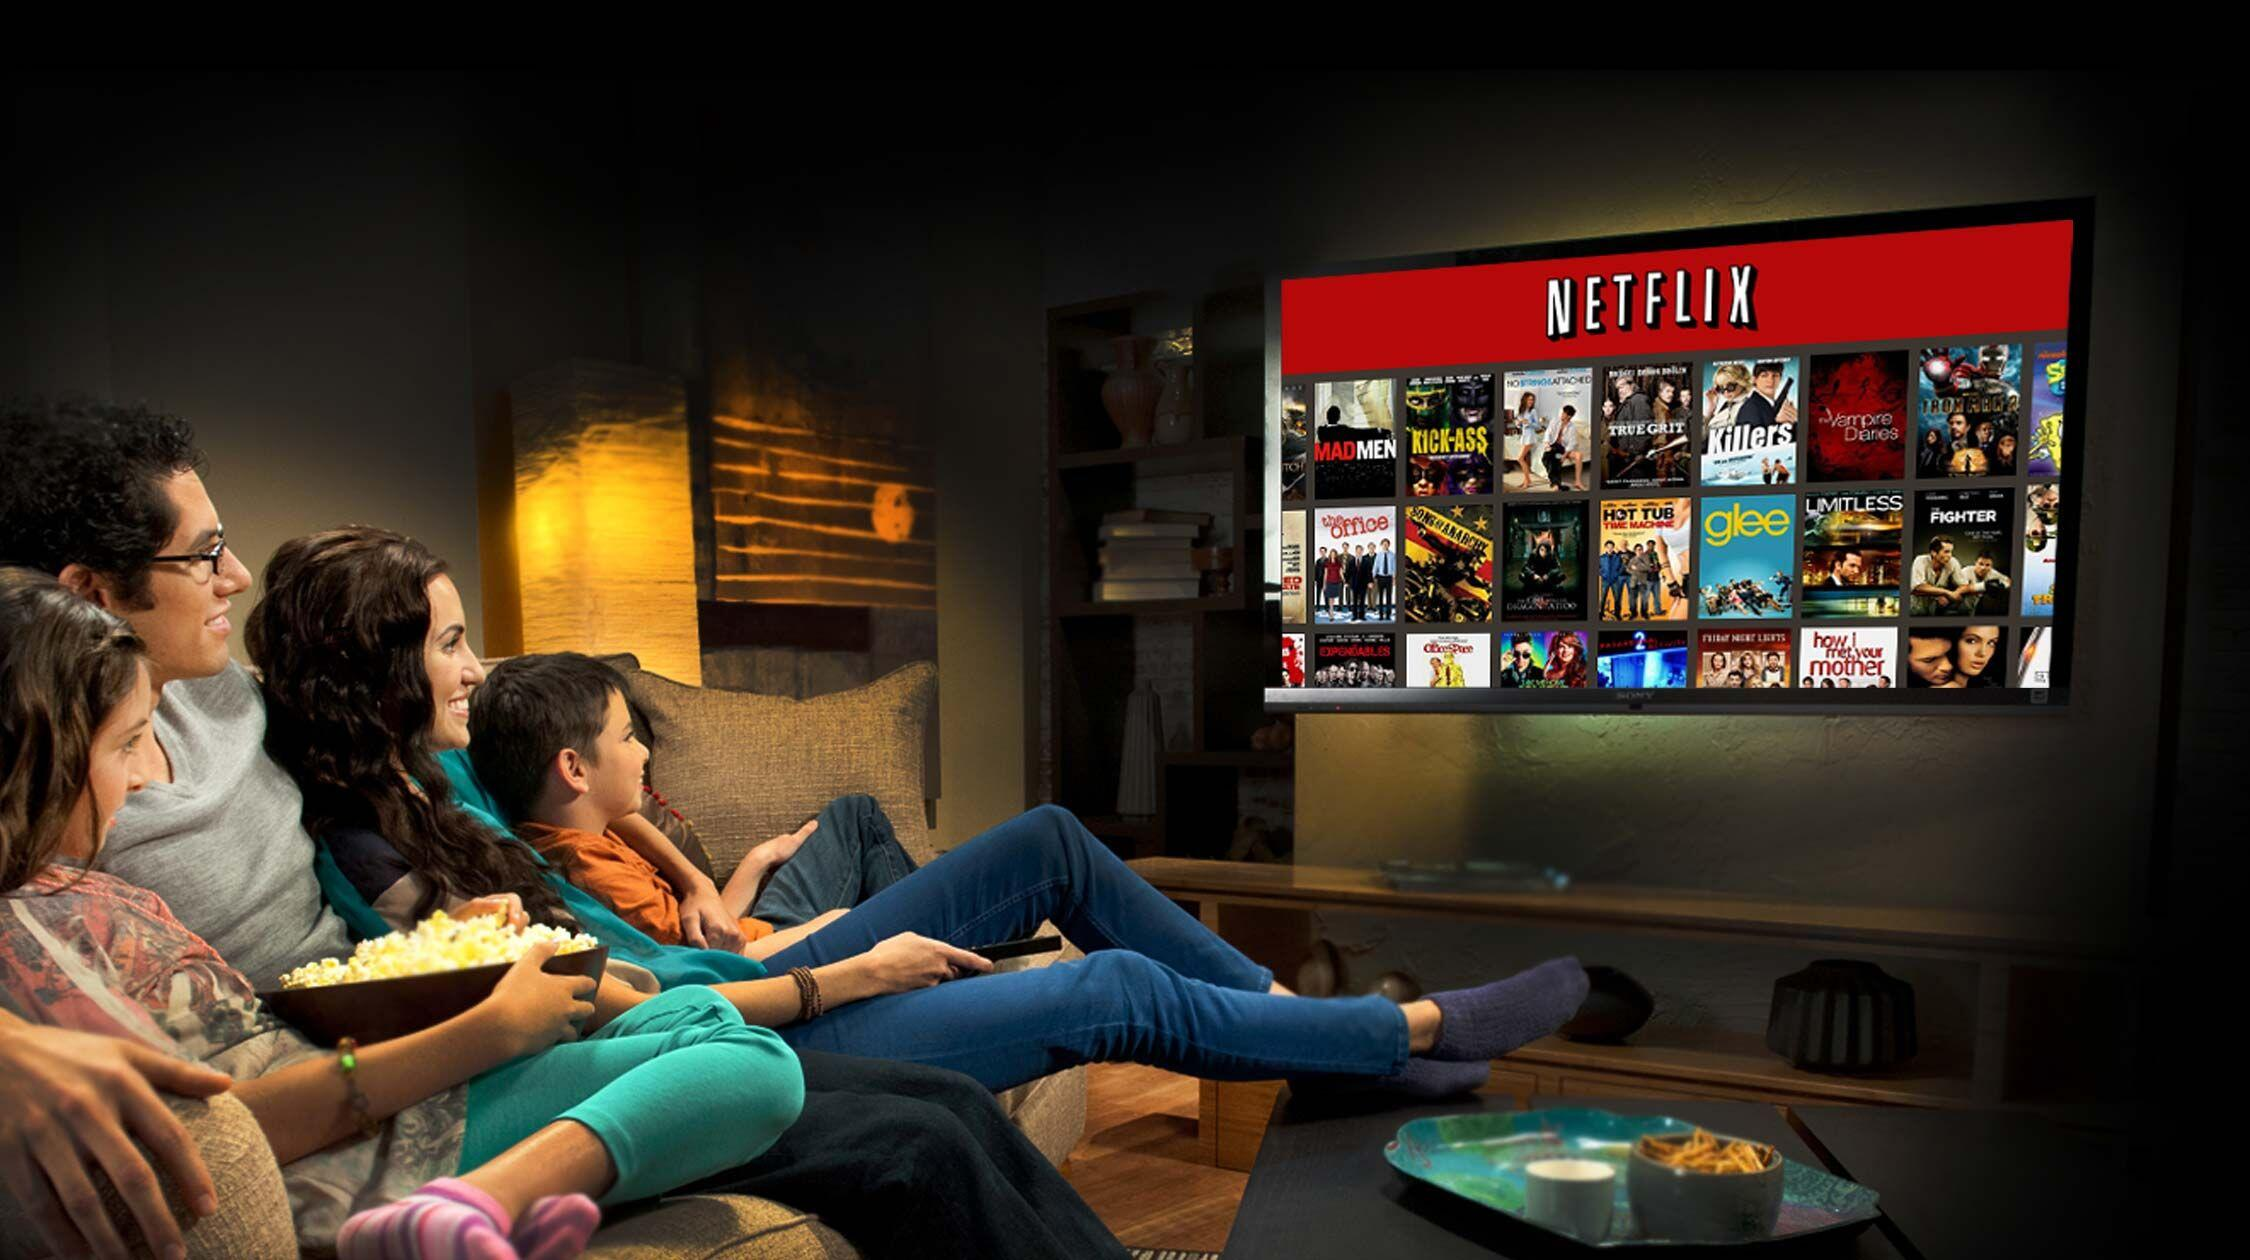 Netflix aile dizi önerisi